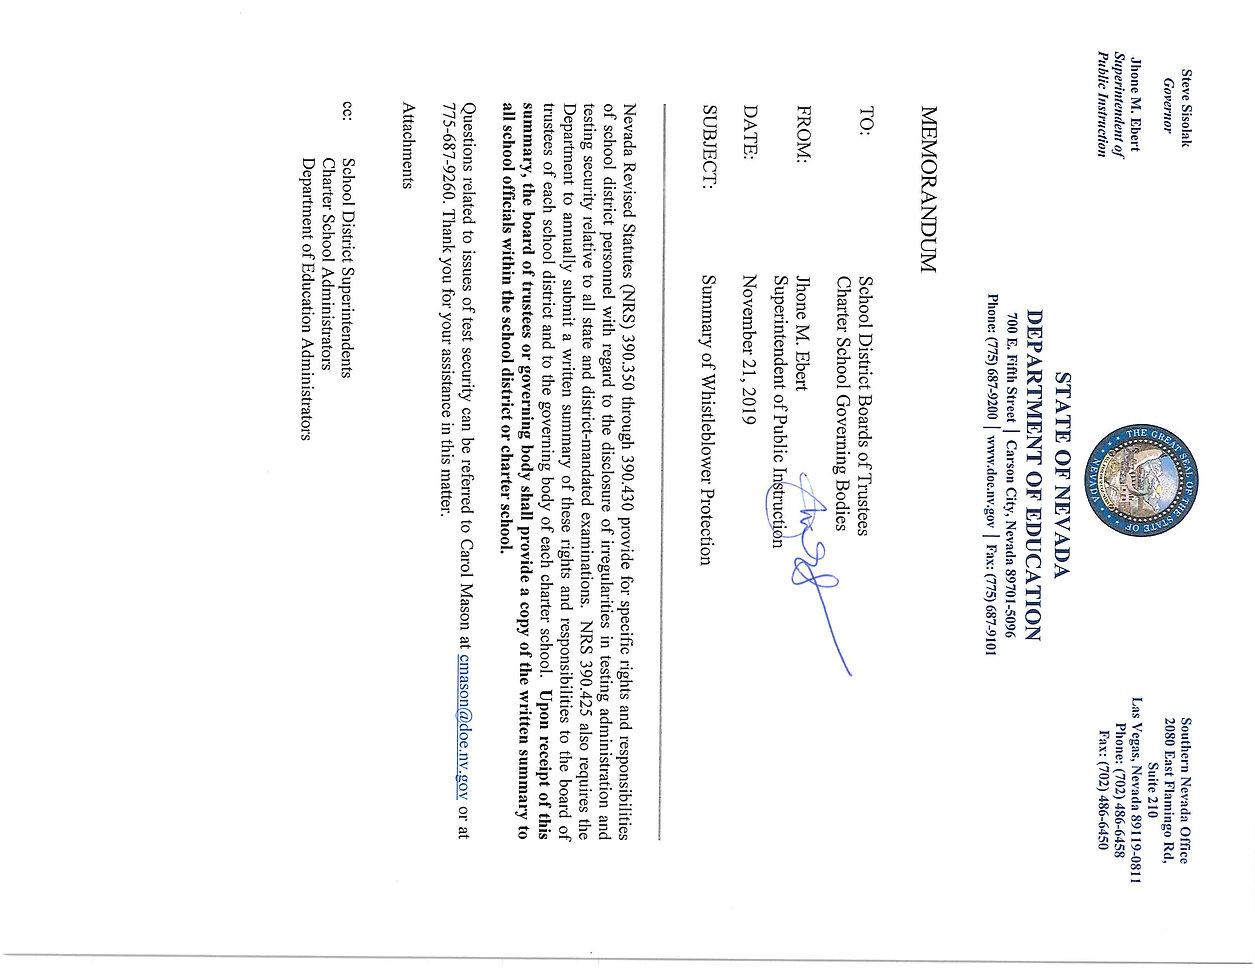 Whistleblower Protection Memo 11.21.19_P